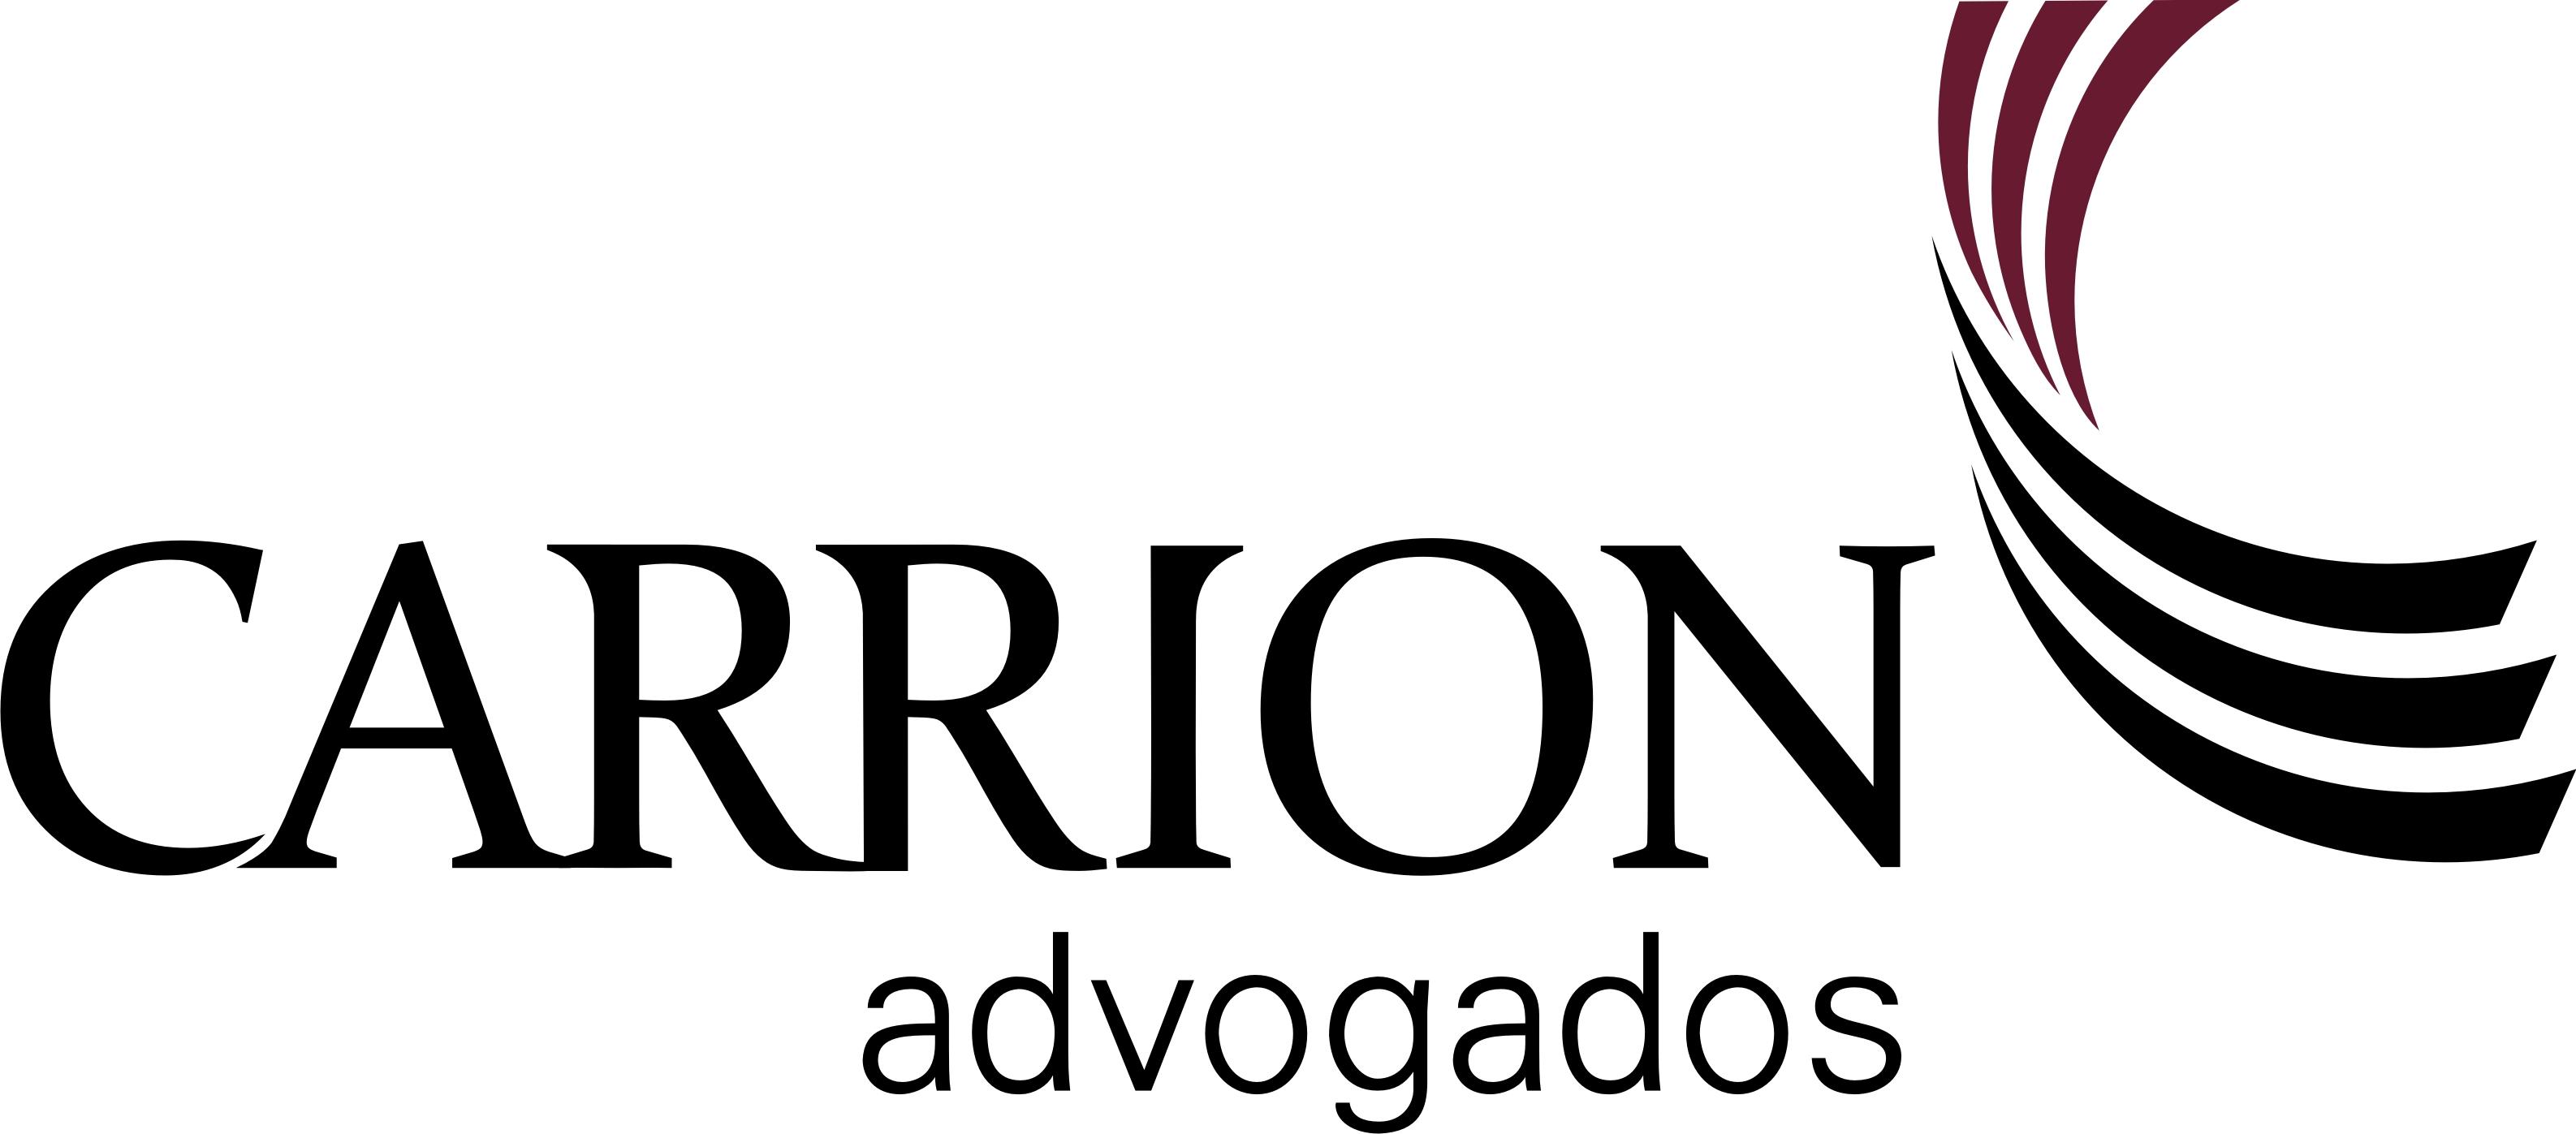 CARRION ADVOGADOS logo